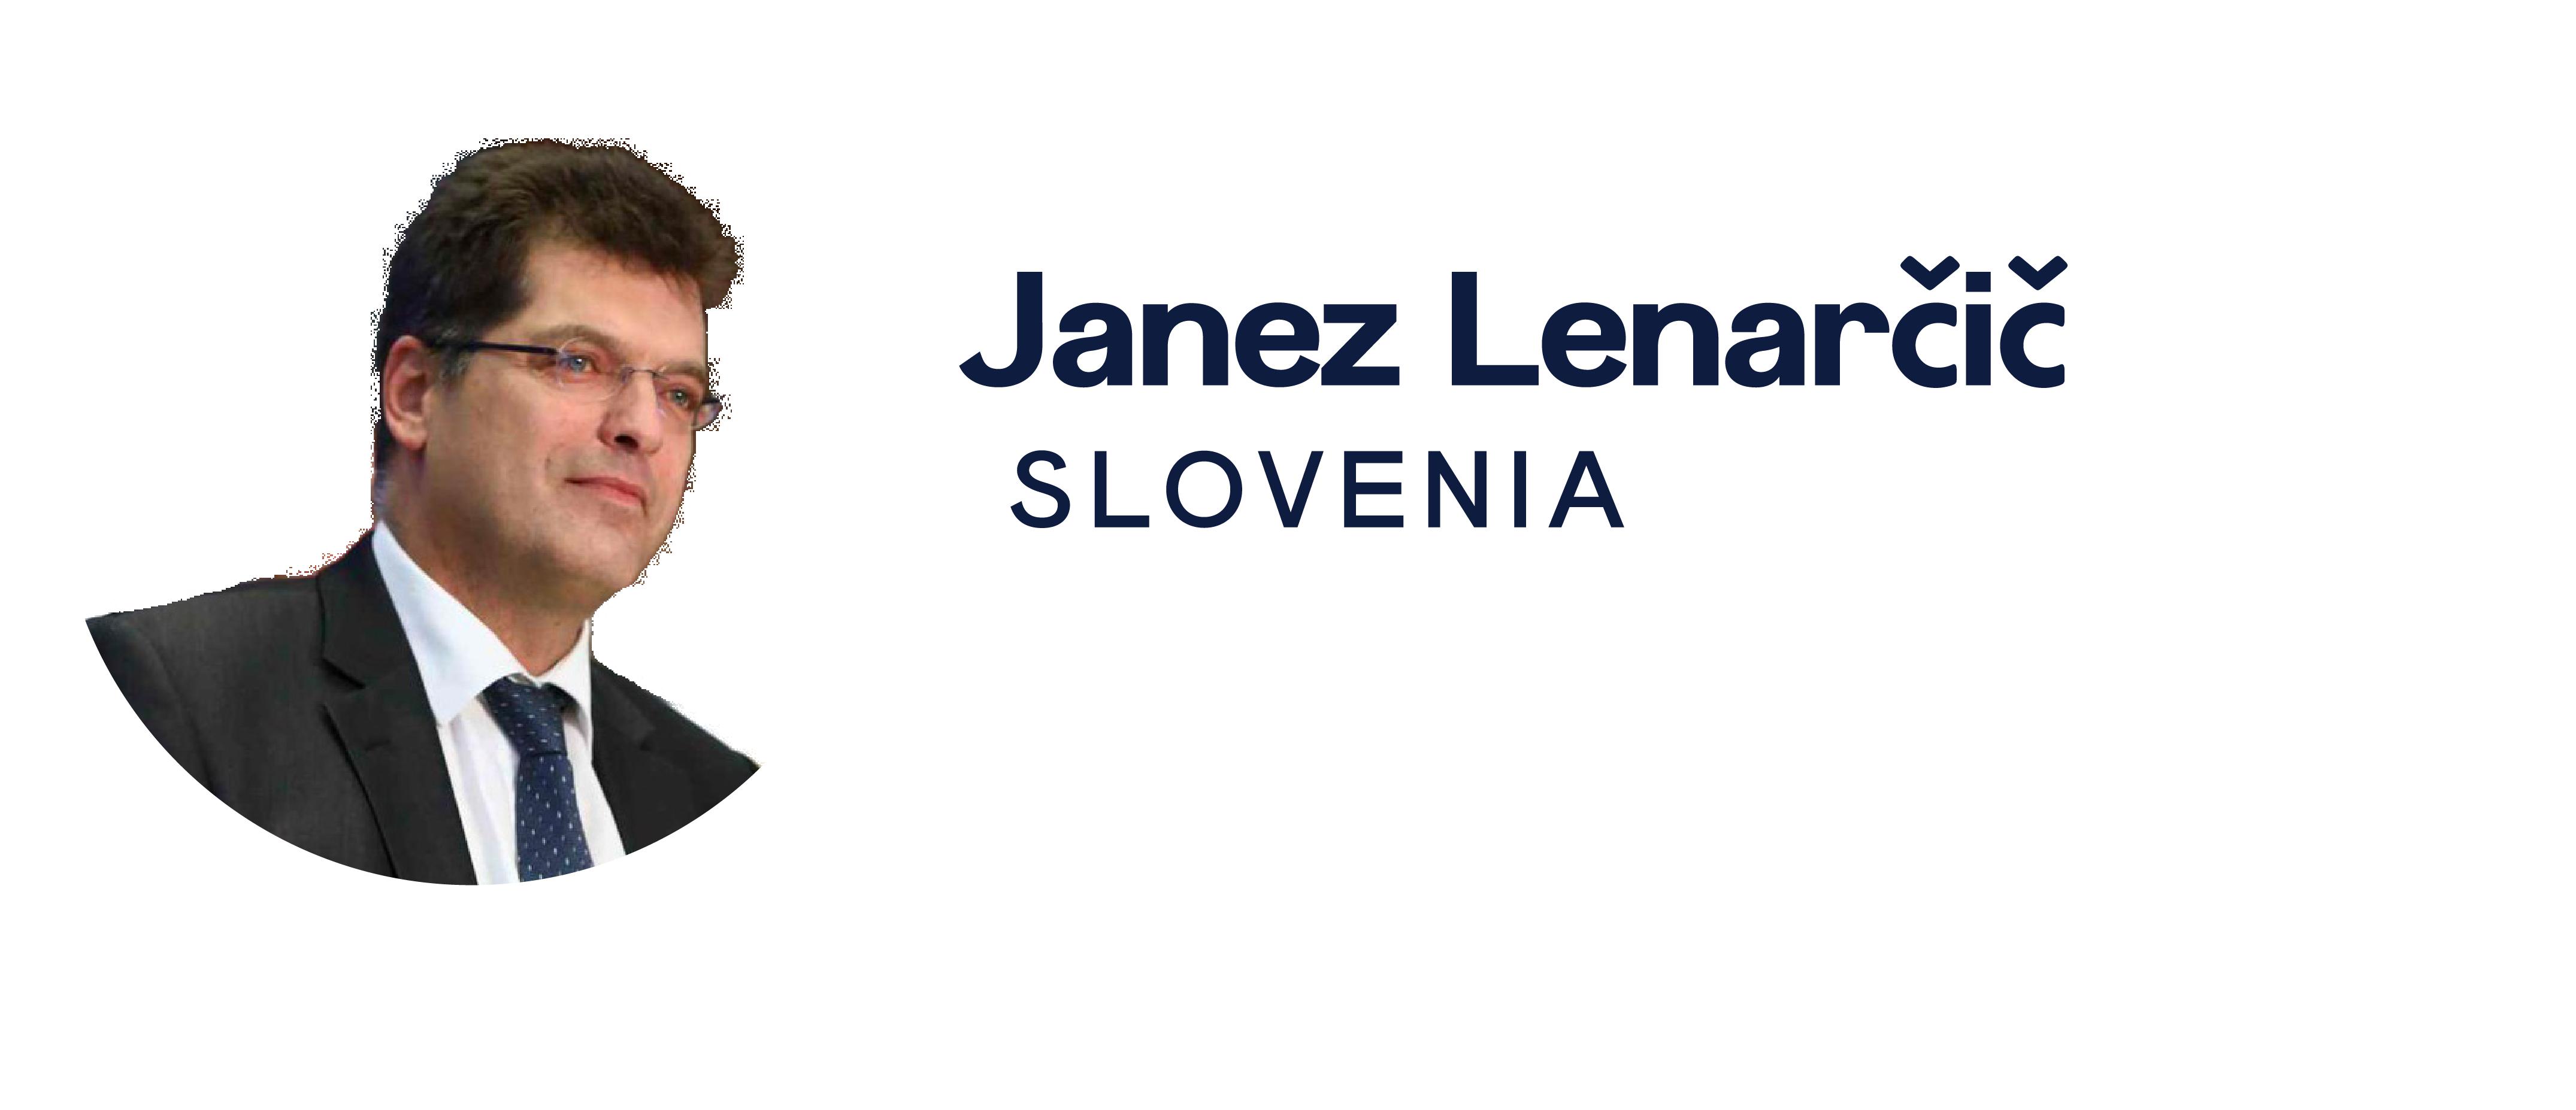 Janez Lenarcic_1